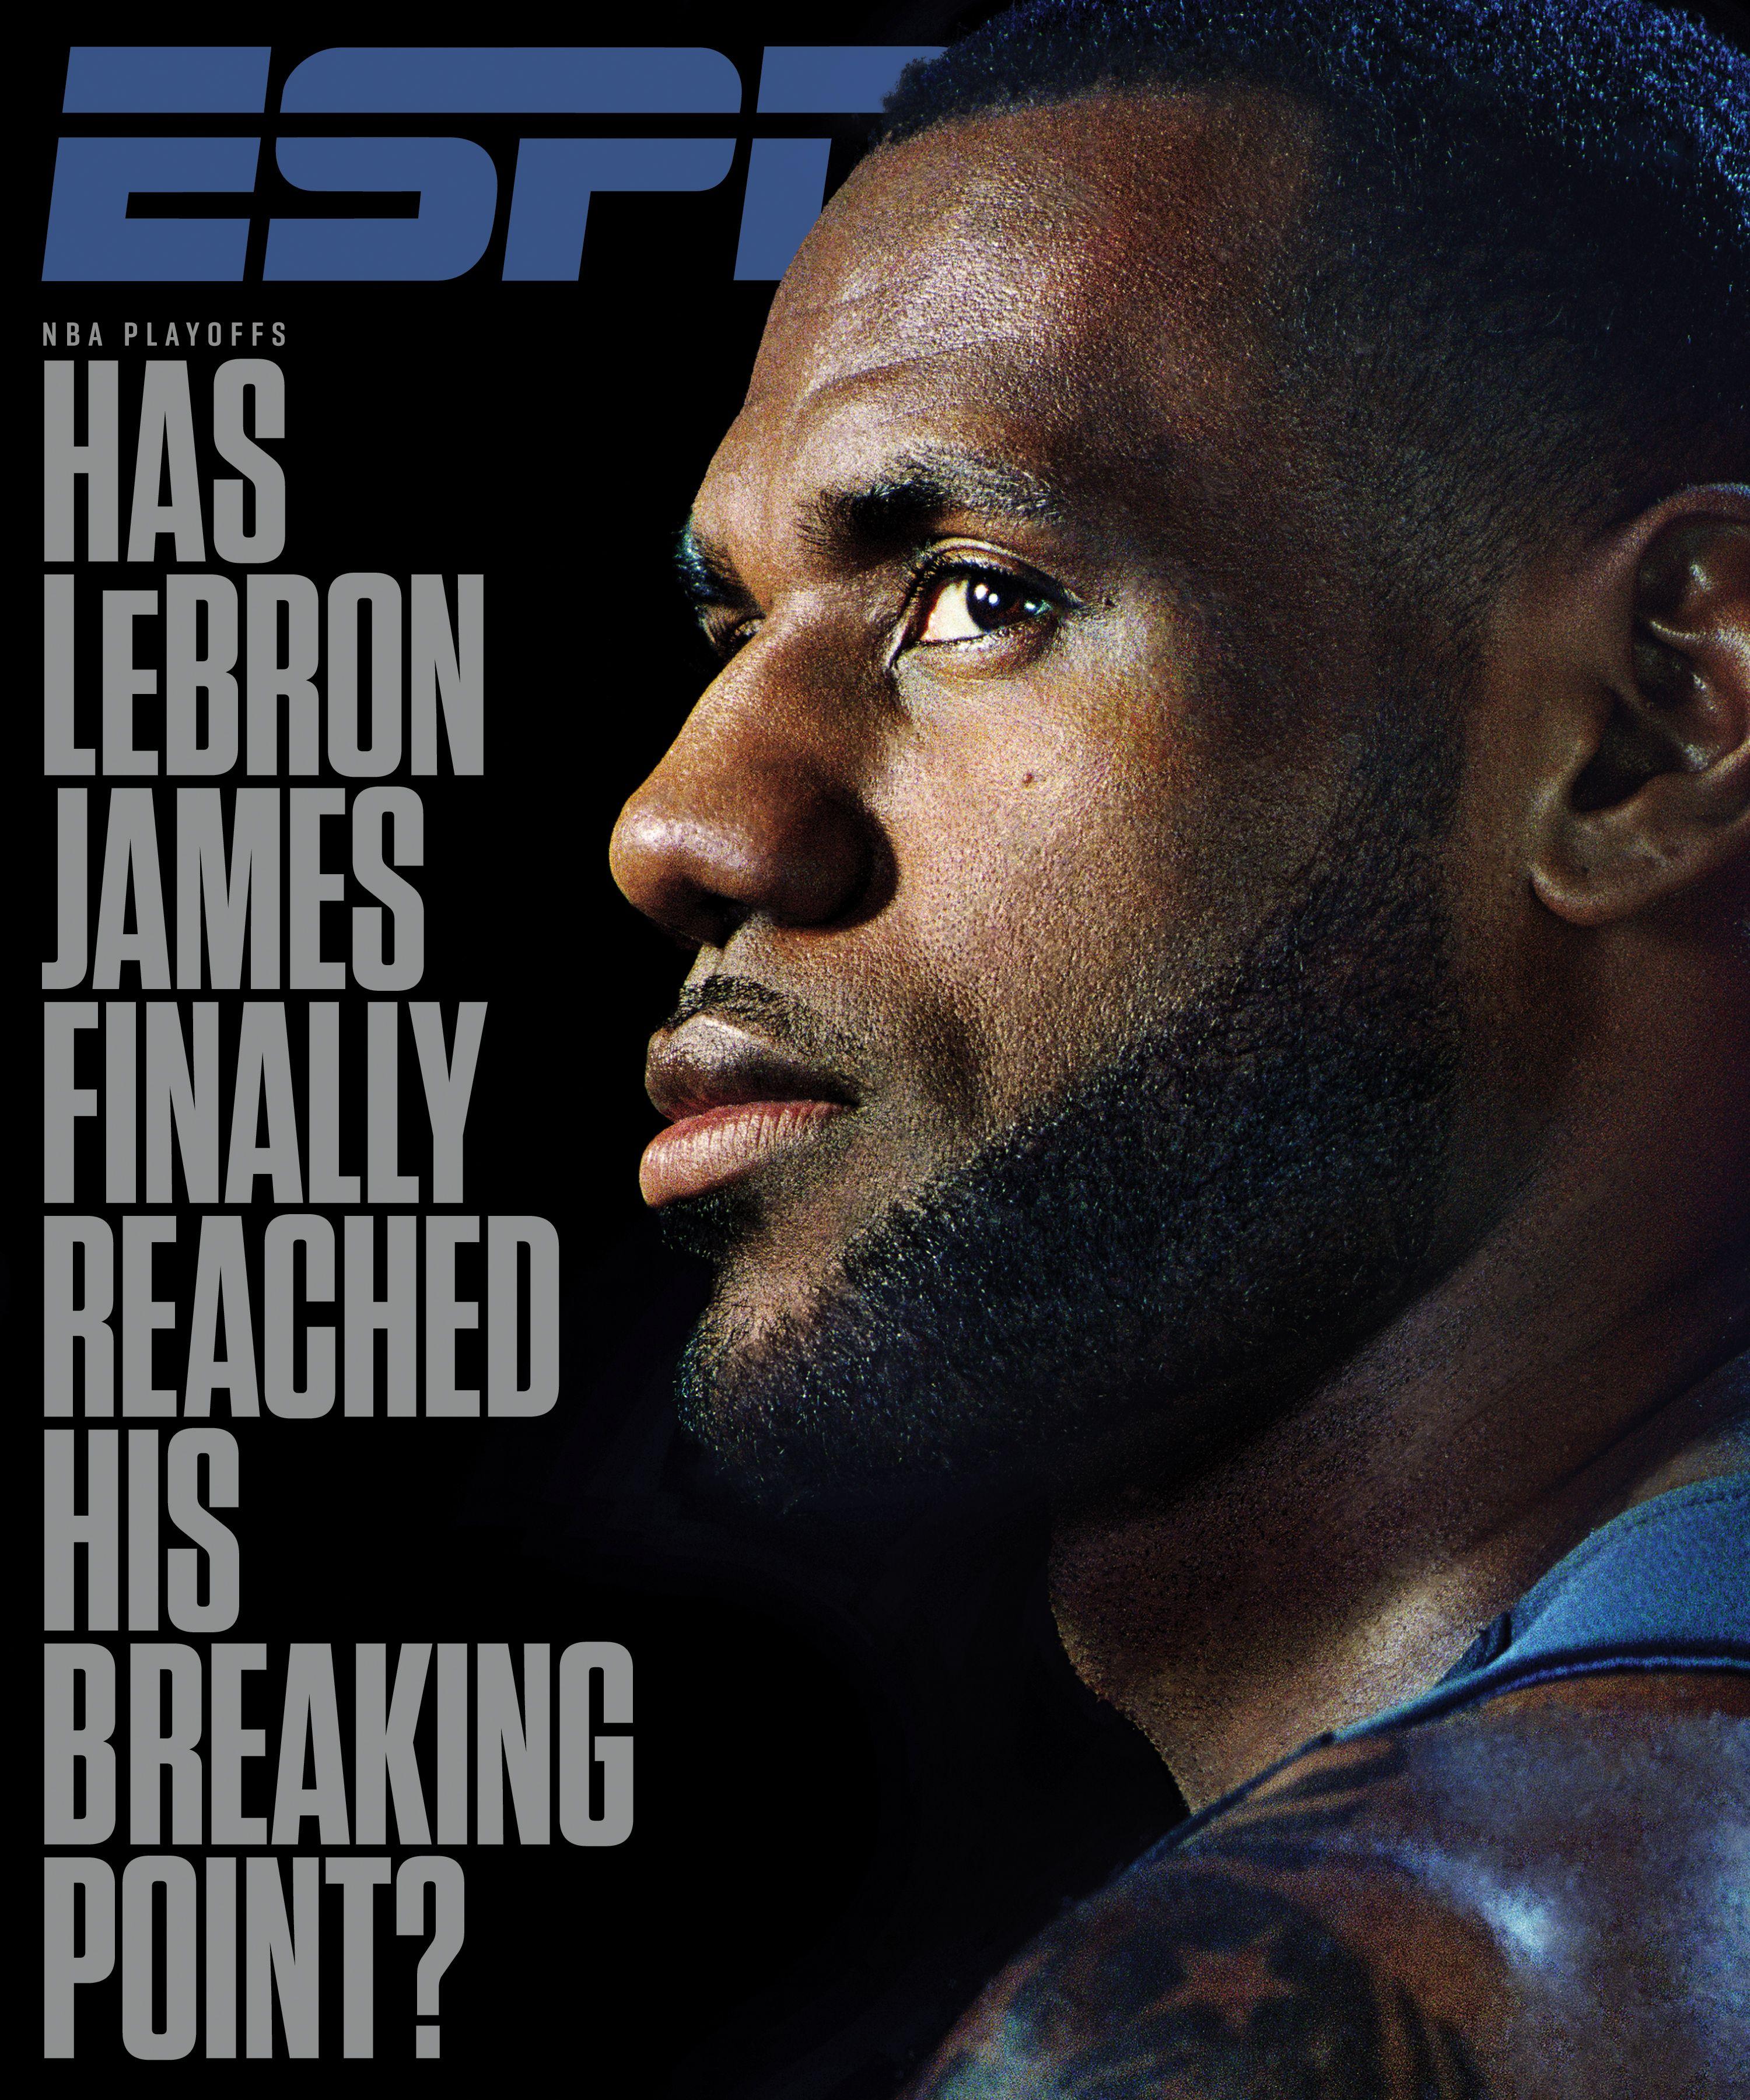 03b9155404de5 TrueHoop Presents: Is this the beginning of LeBron James' End?